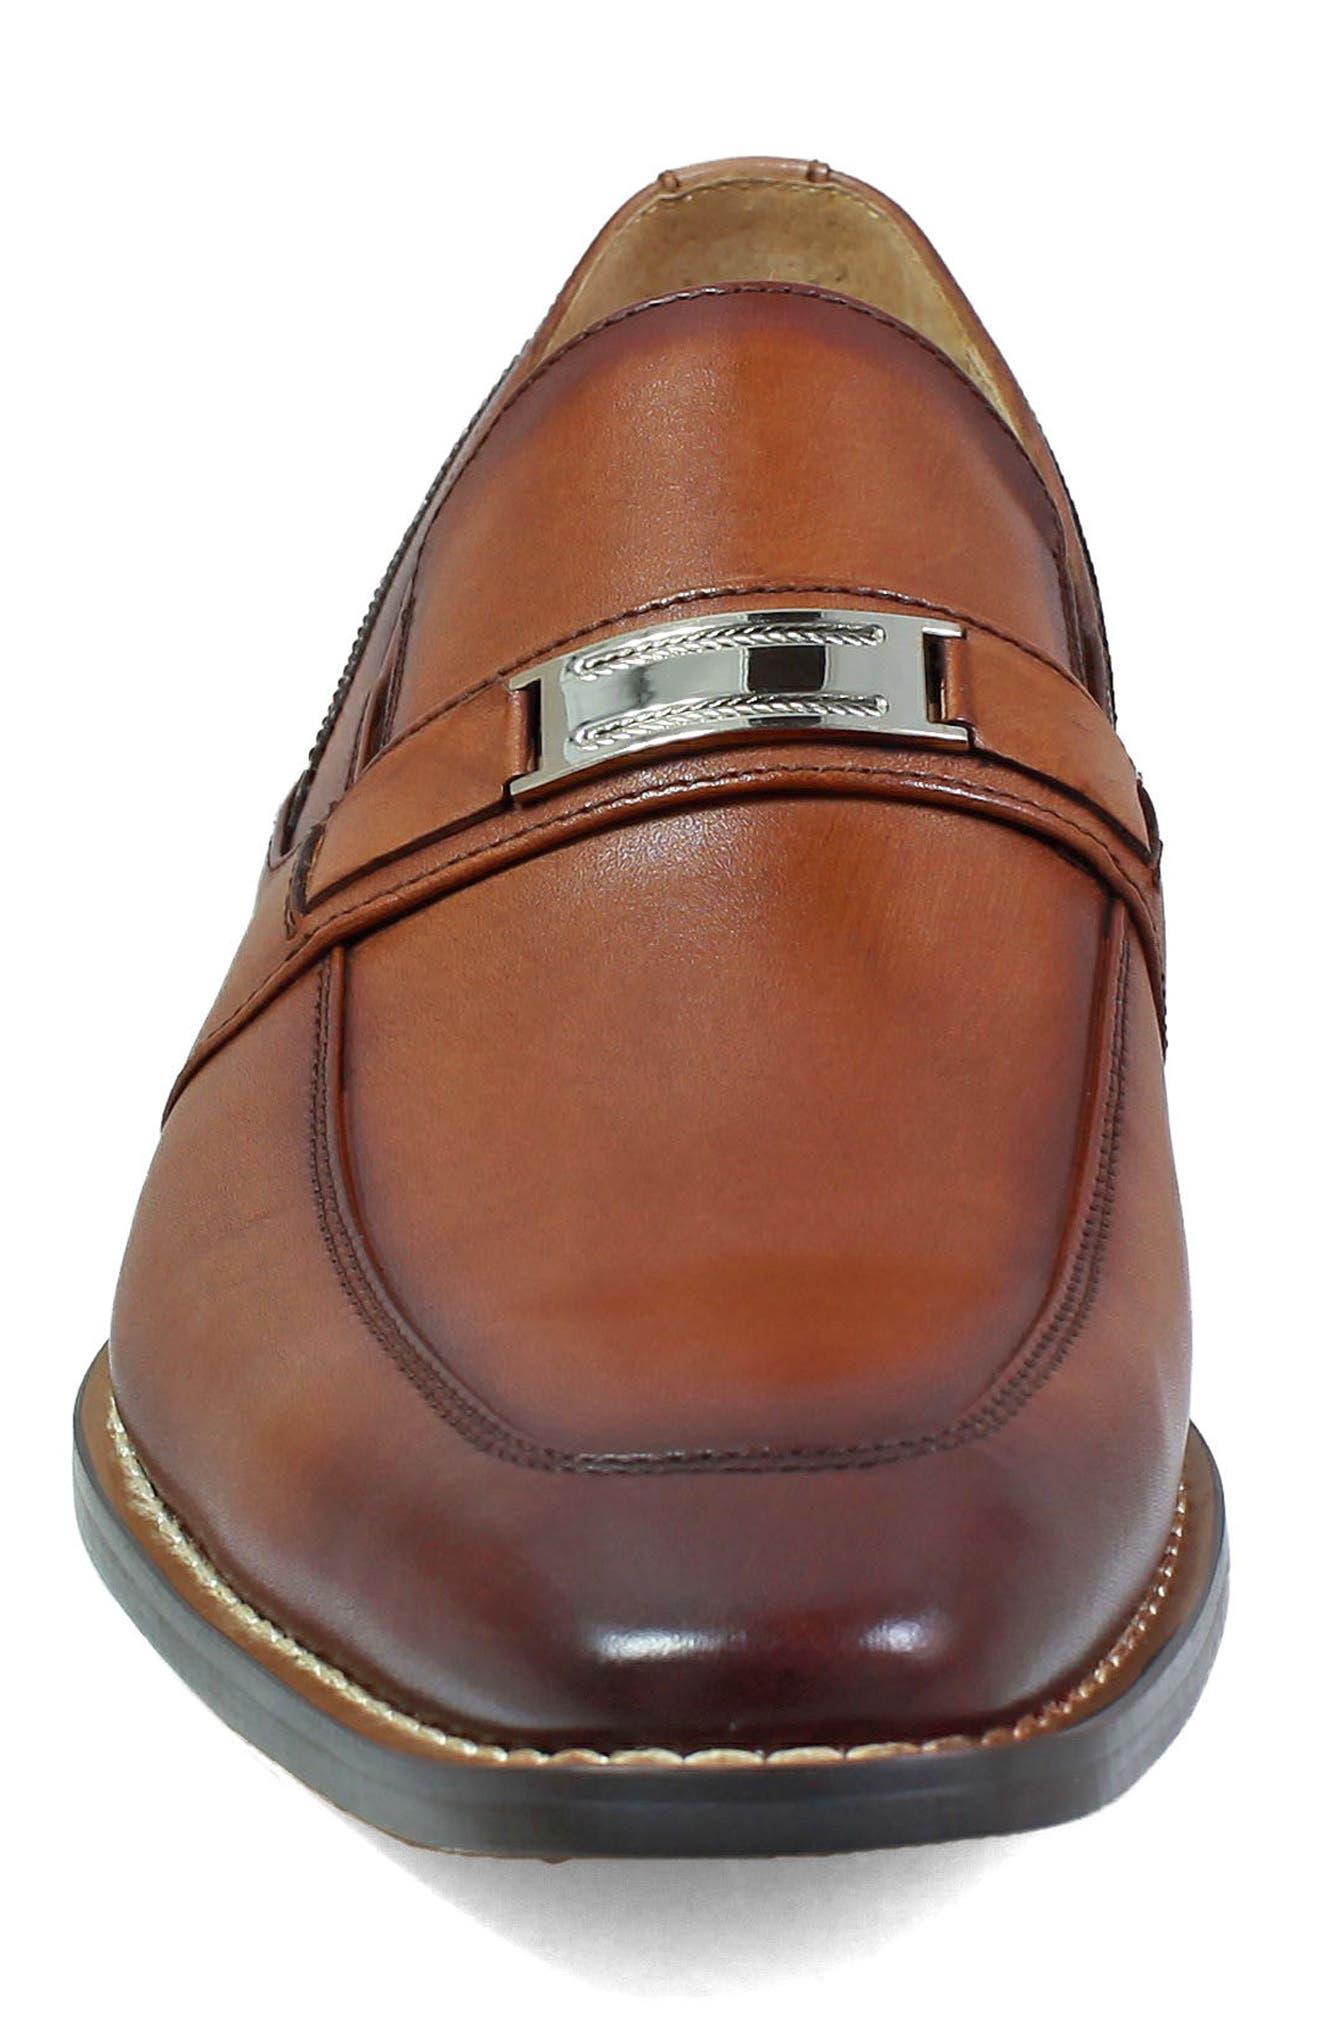 Shaw Bit Loafer,                             Alternate thumbnail 4, color,                             Cognac Leather